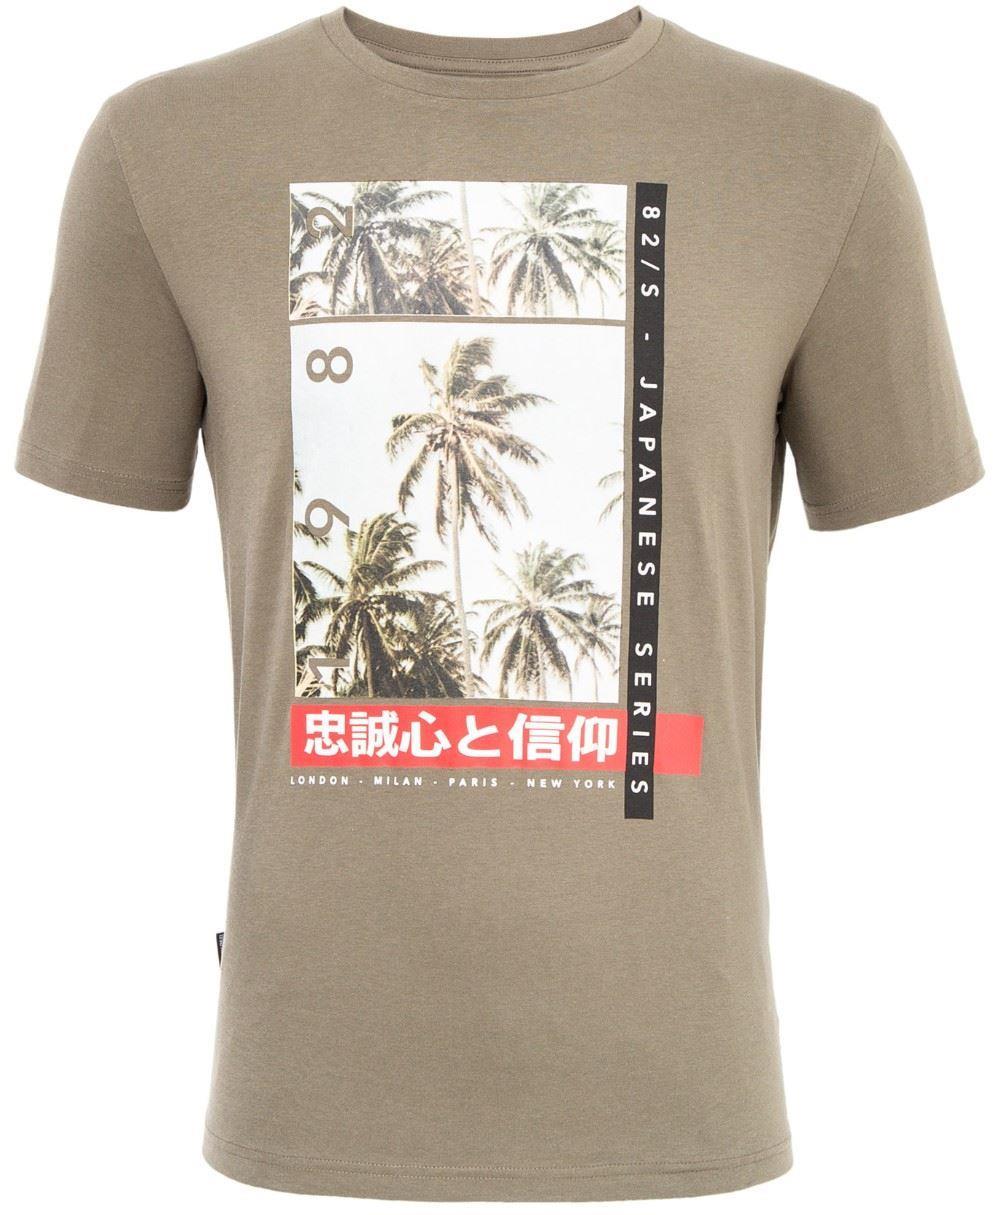 Loyalty & Faith Snap T-Shirt - Green|2XL